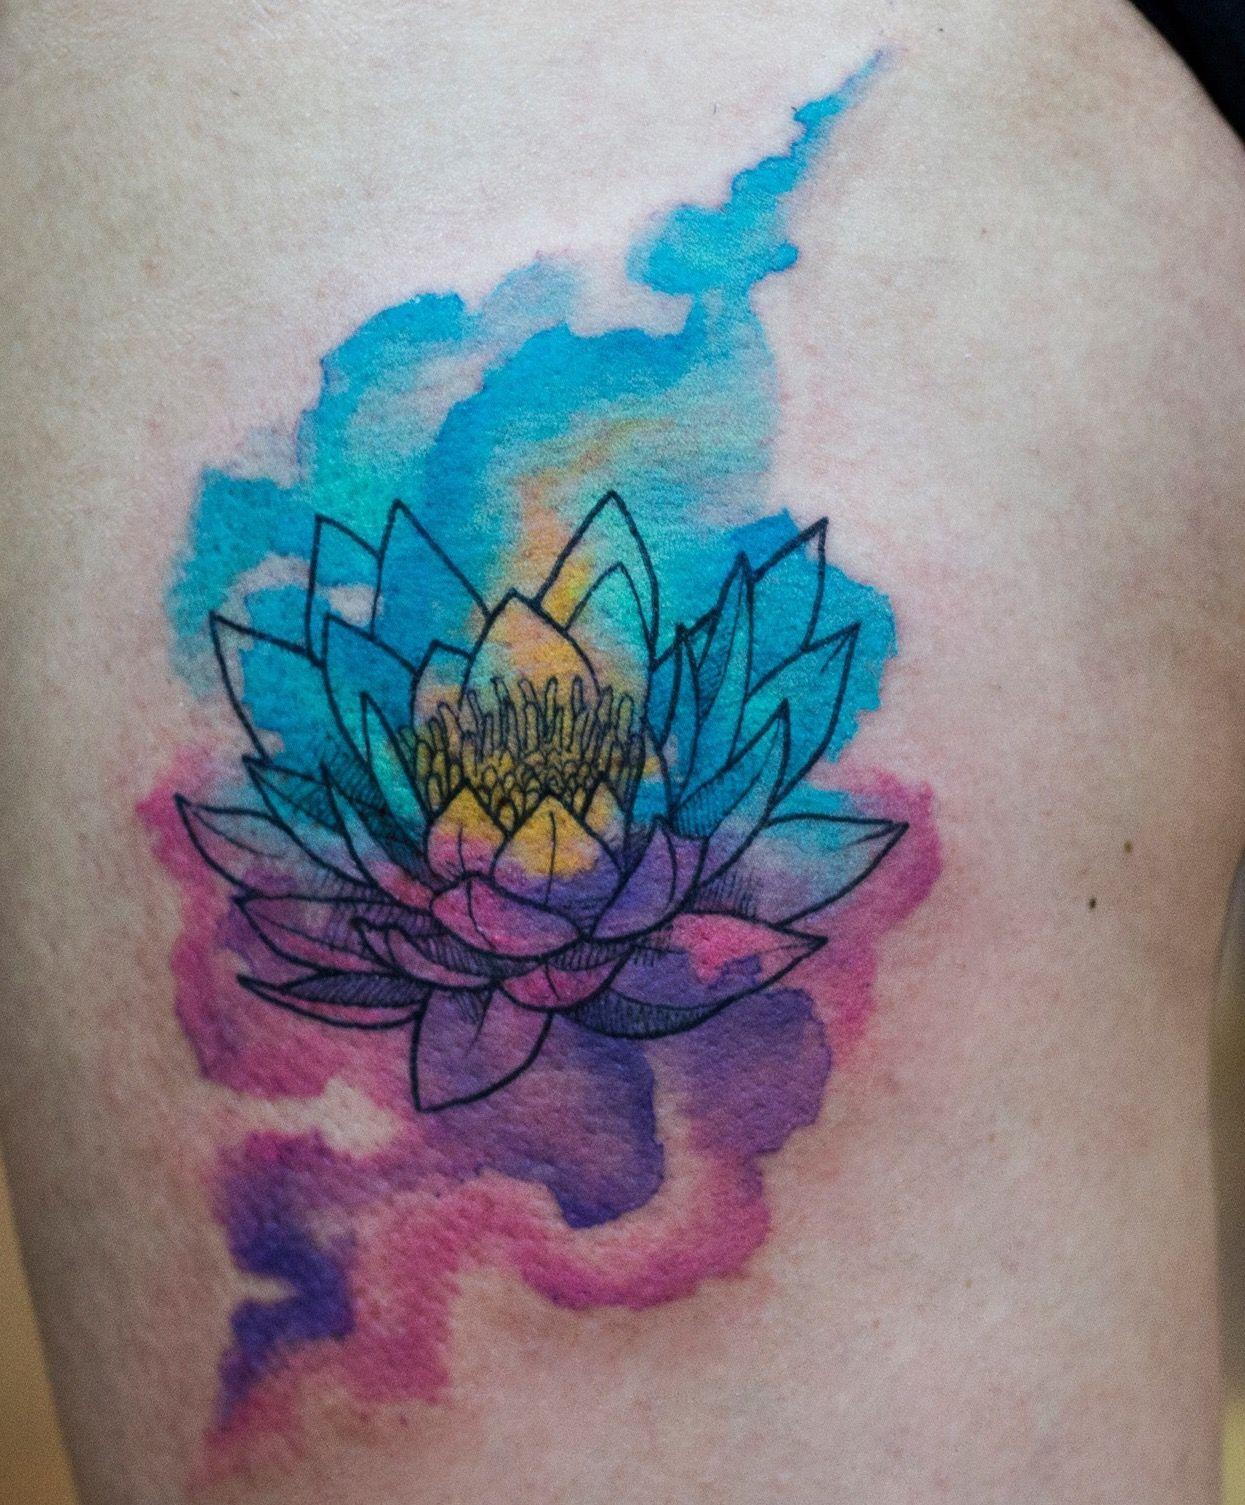 Lotus flower watercolor tattoo tattoos pinterest tattoos lotus flower watercolor tattoo blue lotus tattoo watercolor lotus tattoo watercolor flowers watercolour izmirmasajfo